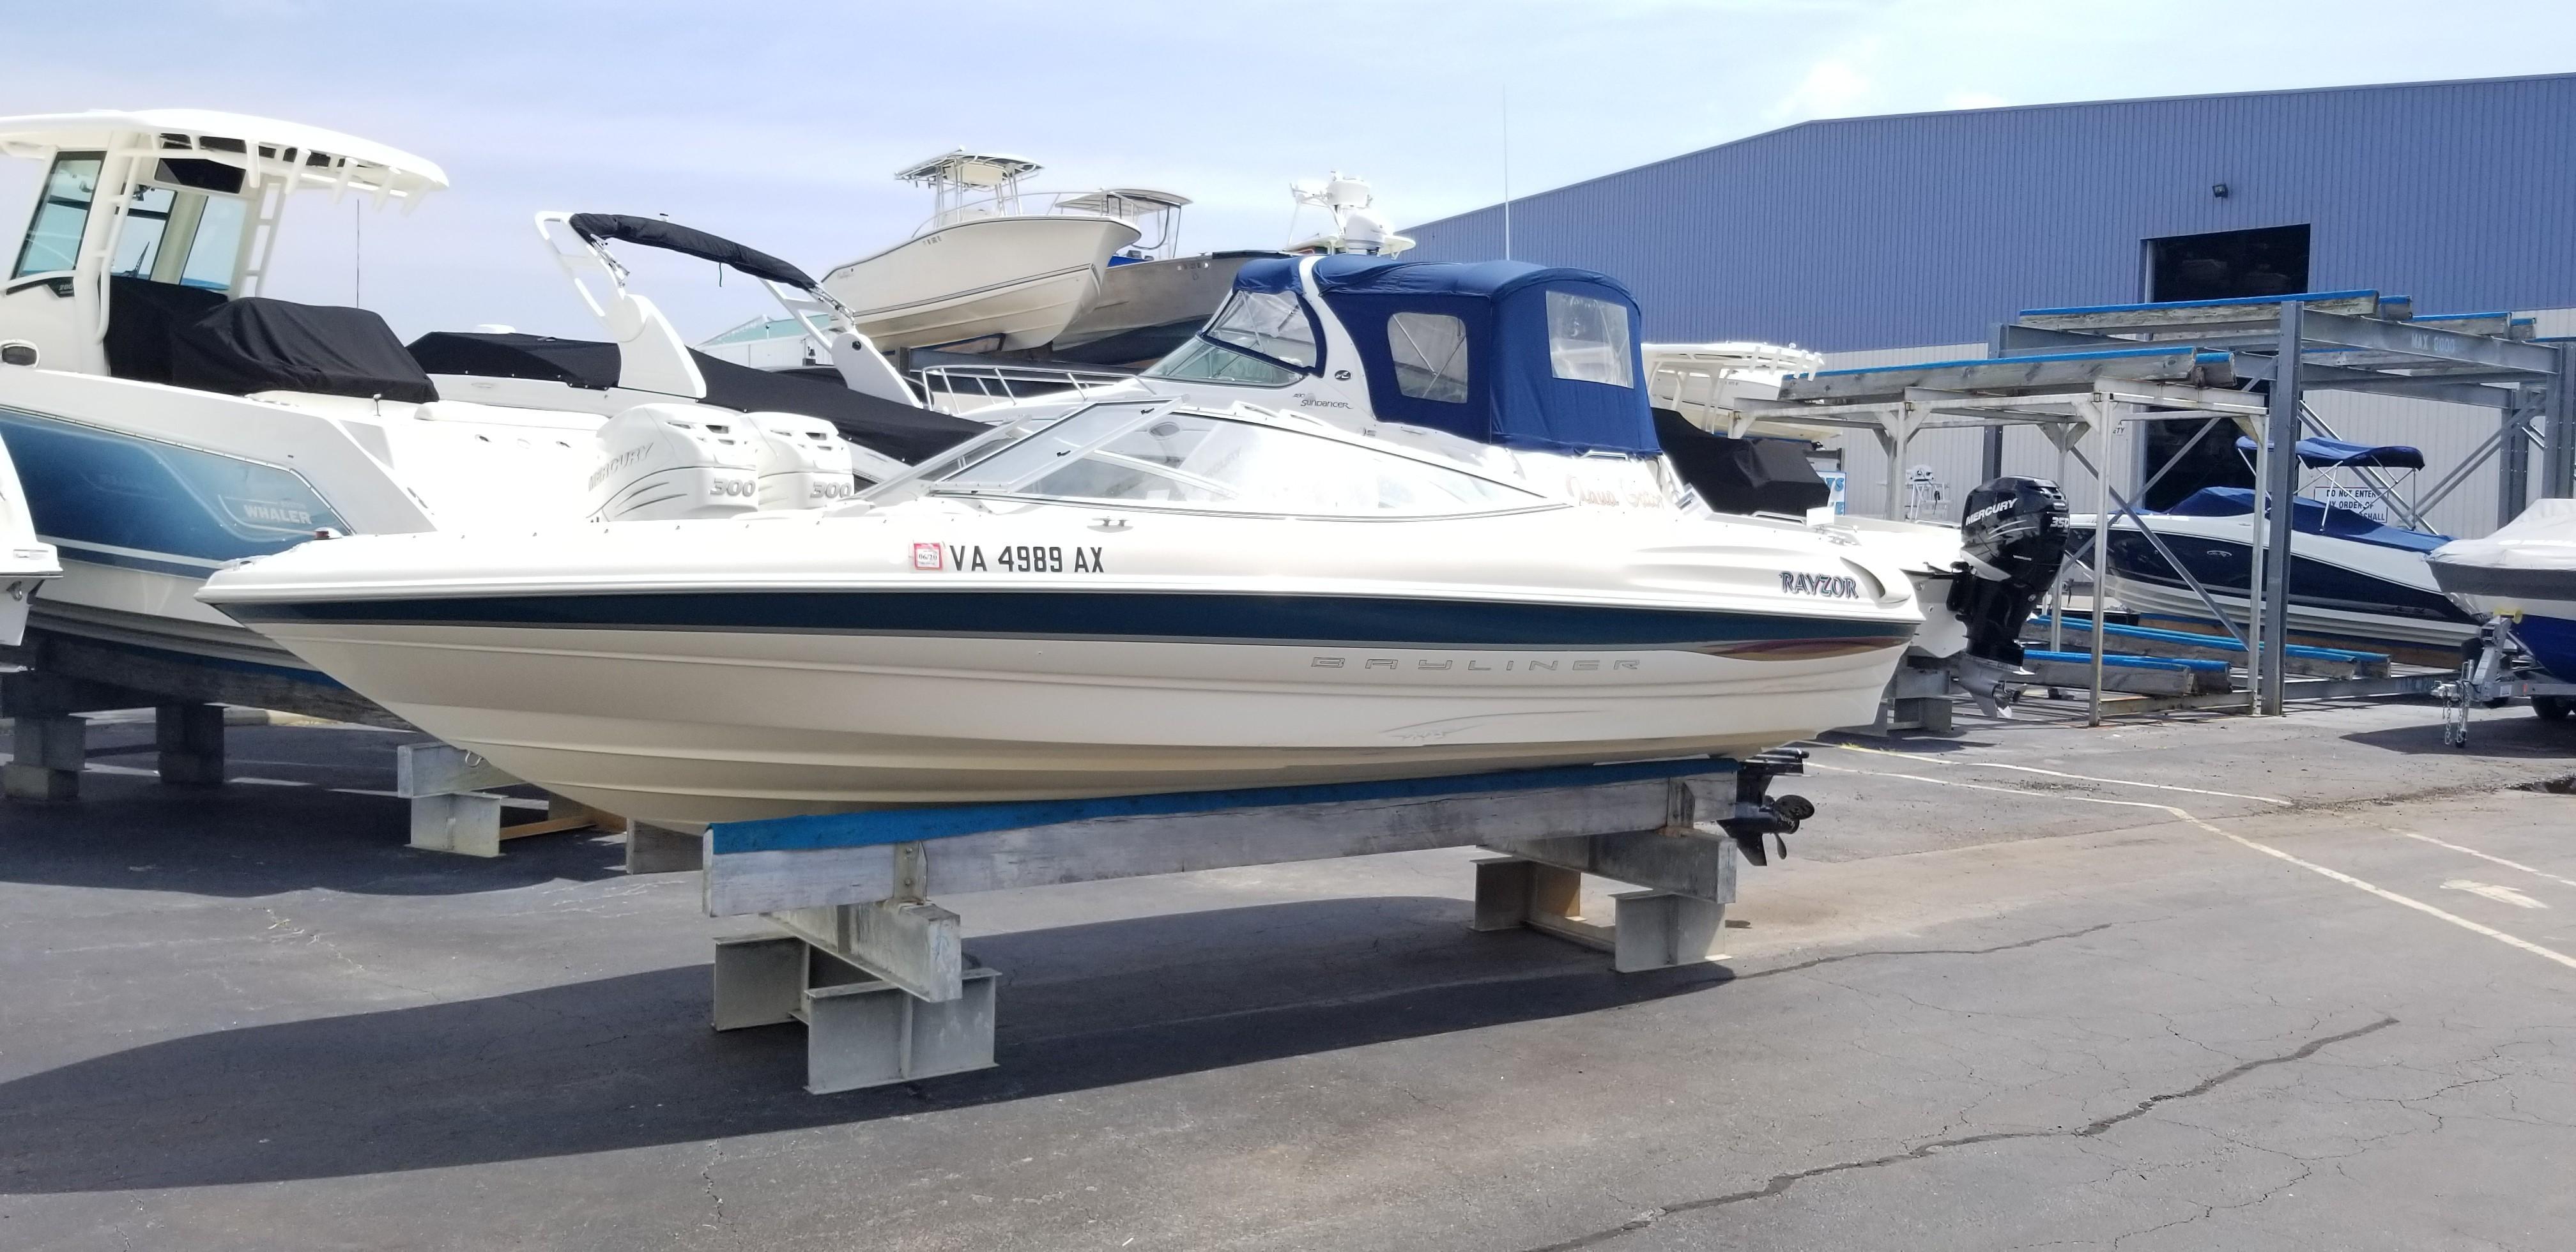 Bayliner2050 Capri DX/LX